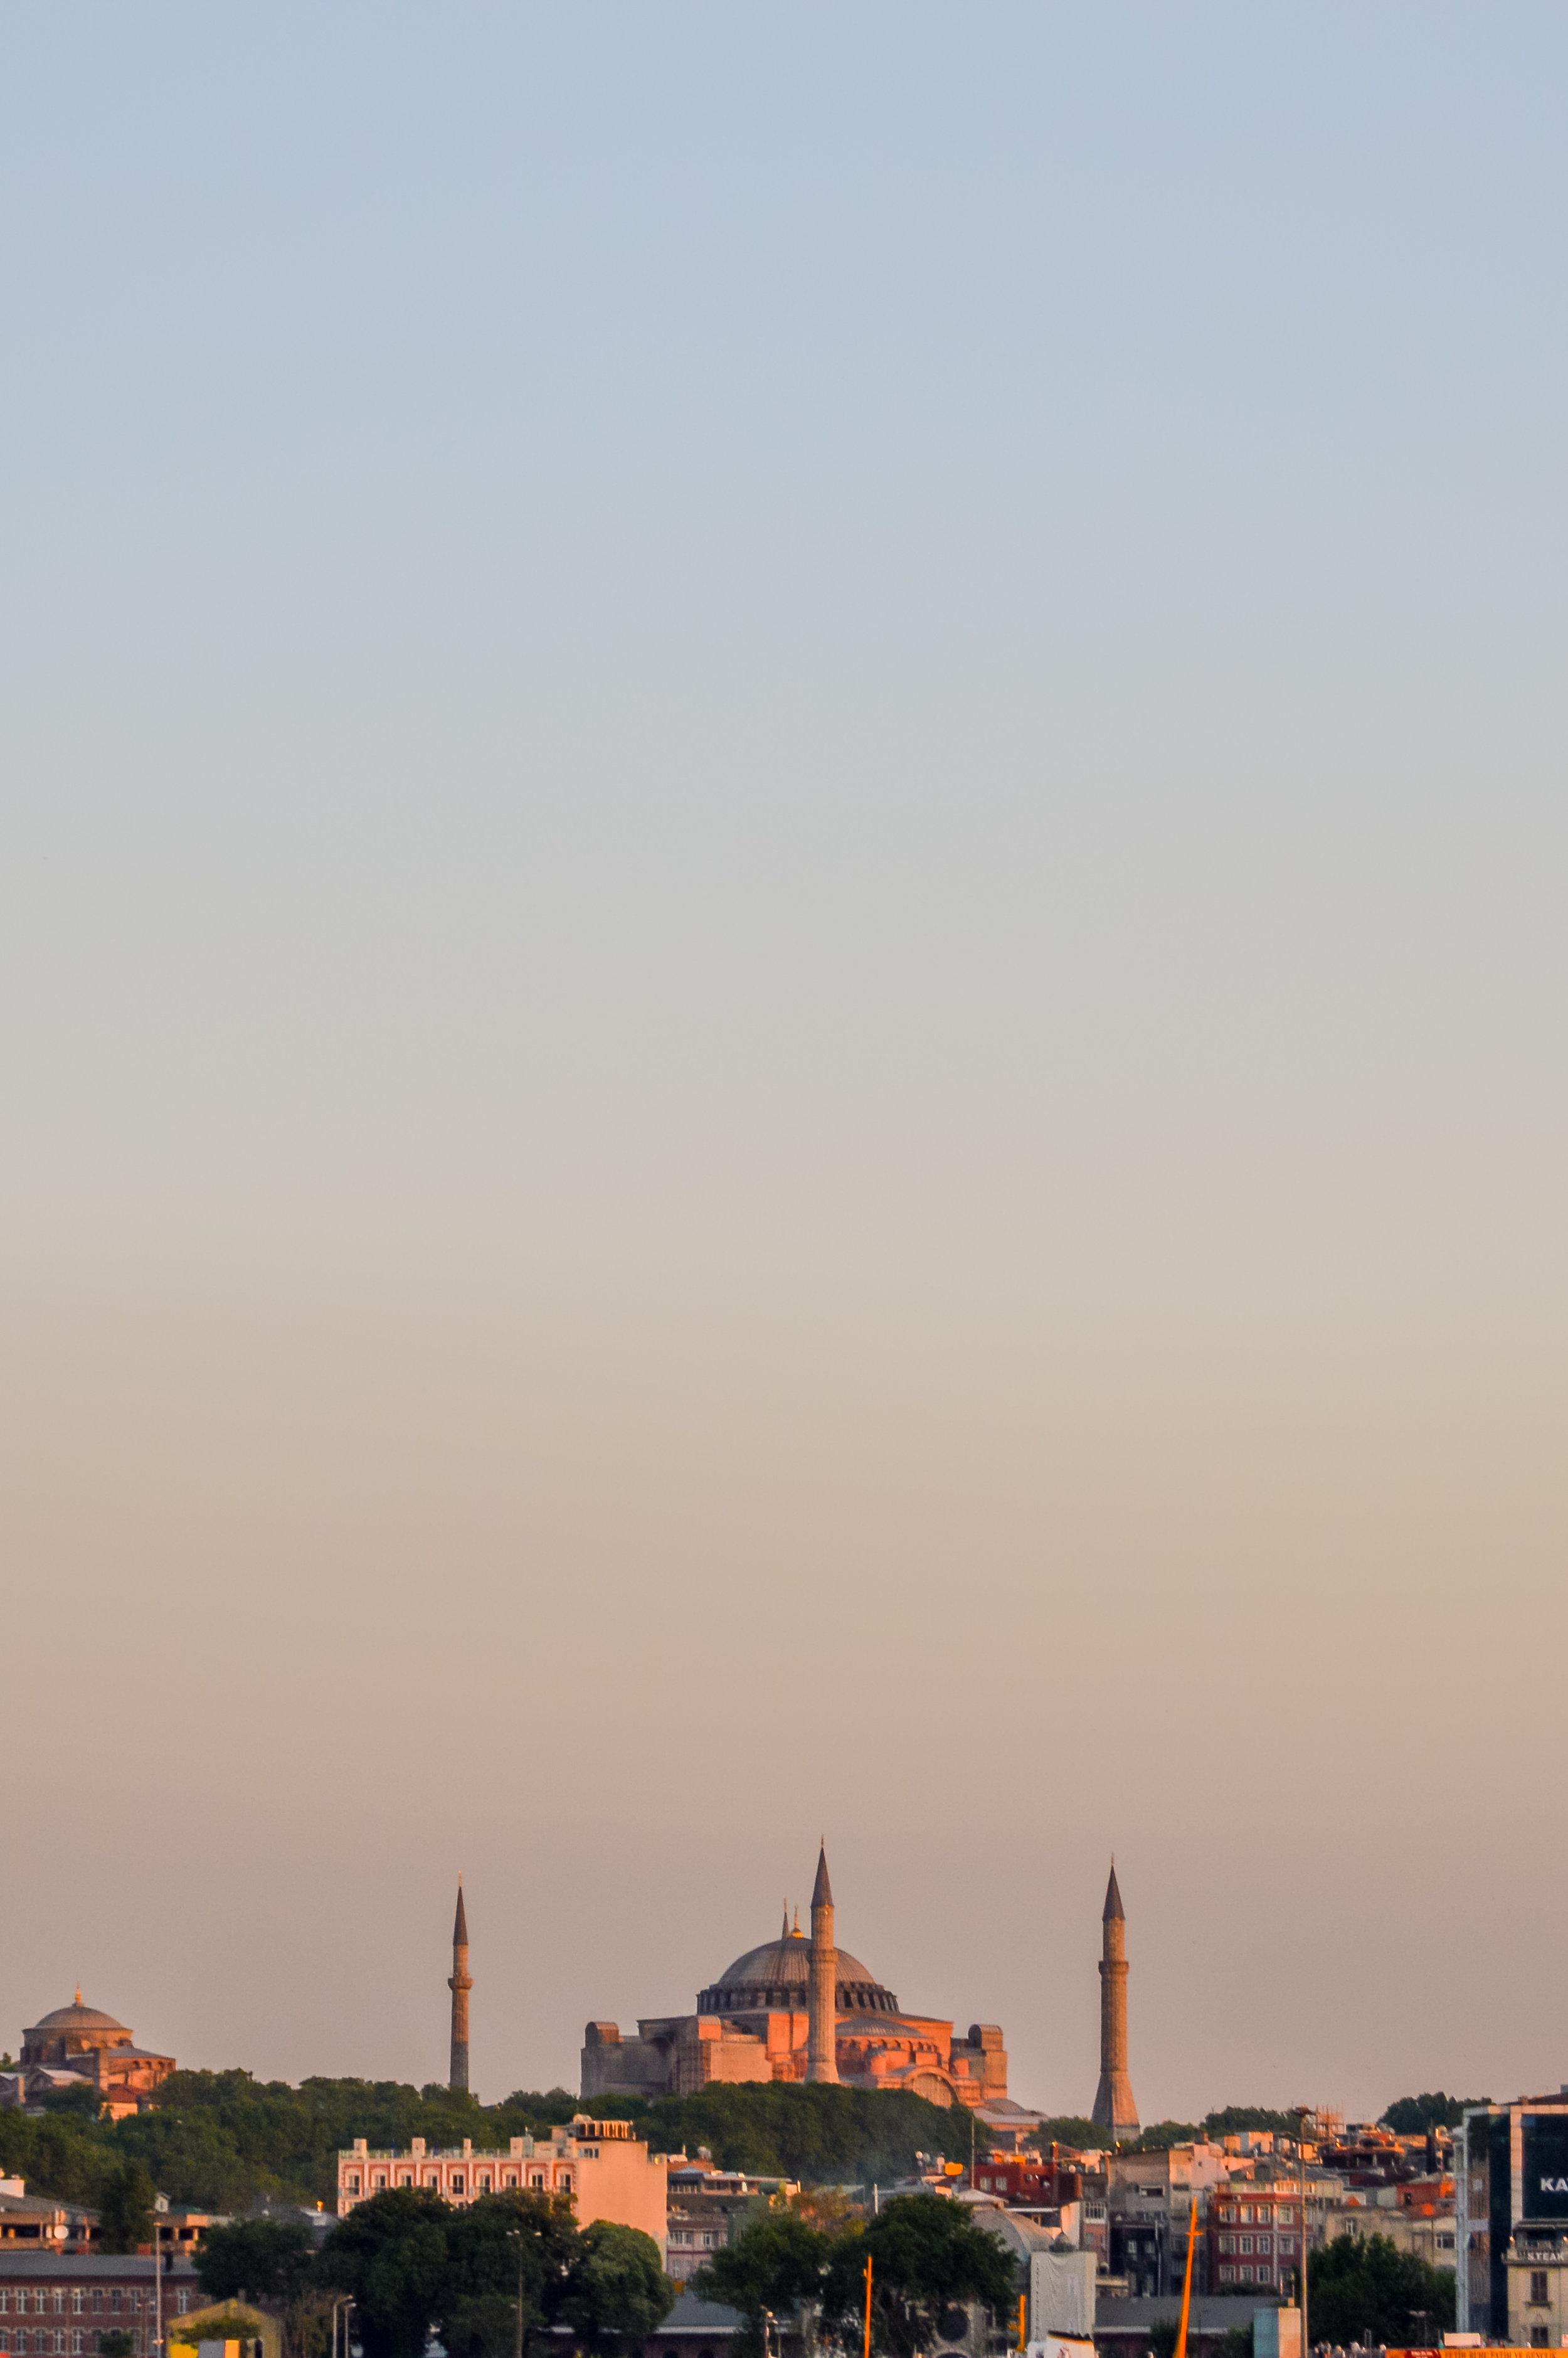 Hagia Sophia Mosque Minaret Sunset Blue Sky Muslim Ottoman Empire Architecture Istanbul Turkey